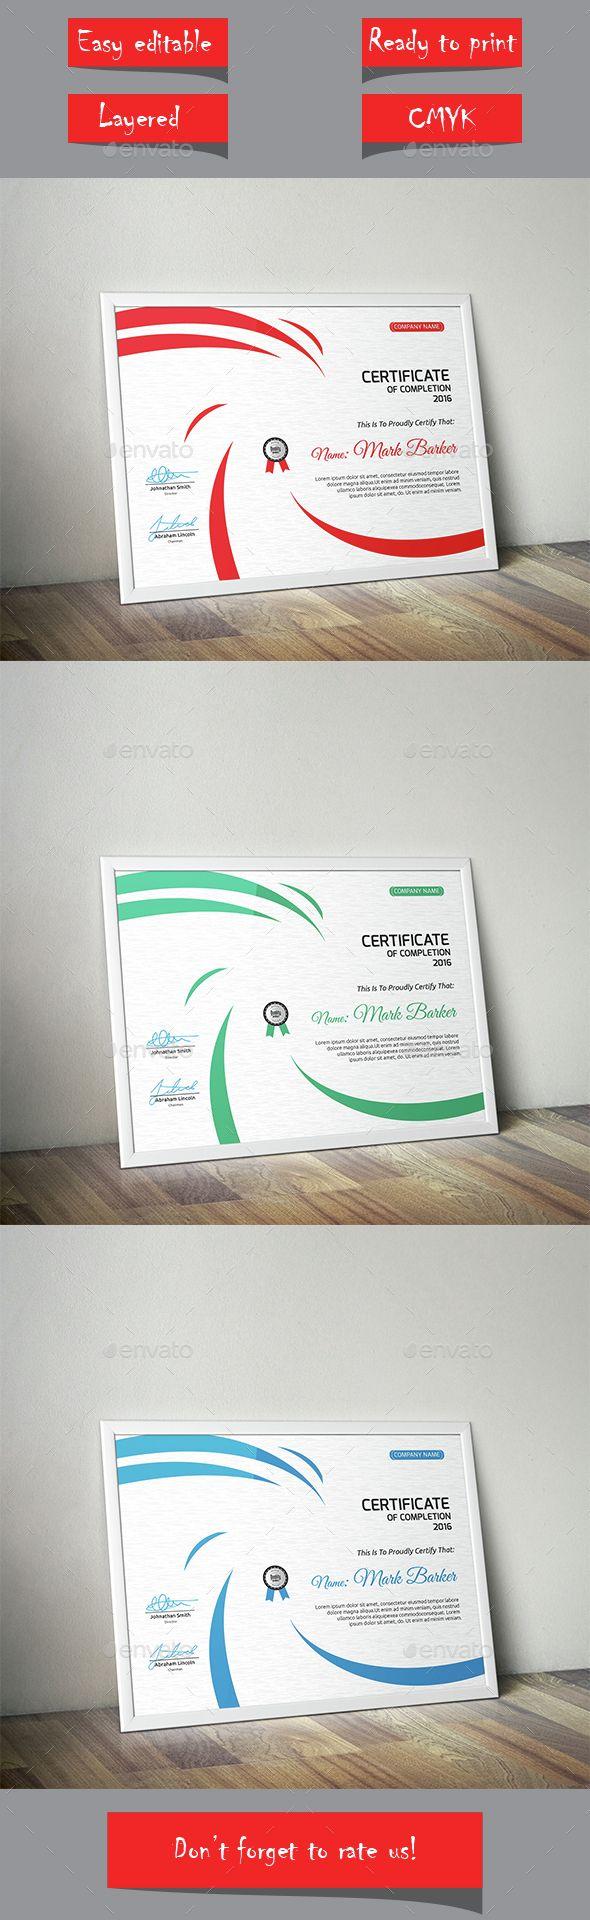 213 best CERTIFICATE images on Pinterest | Award certificates ...